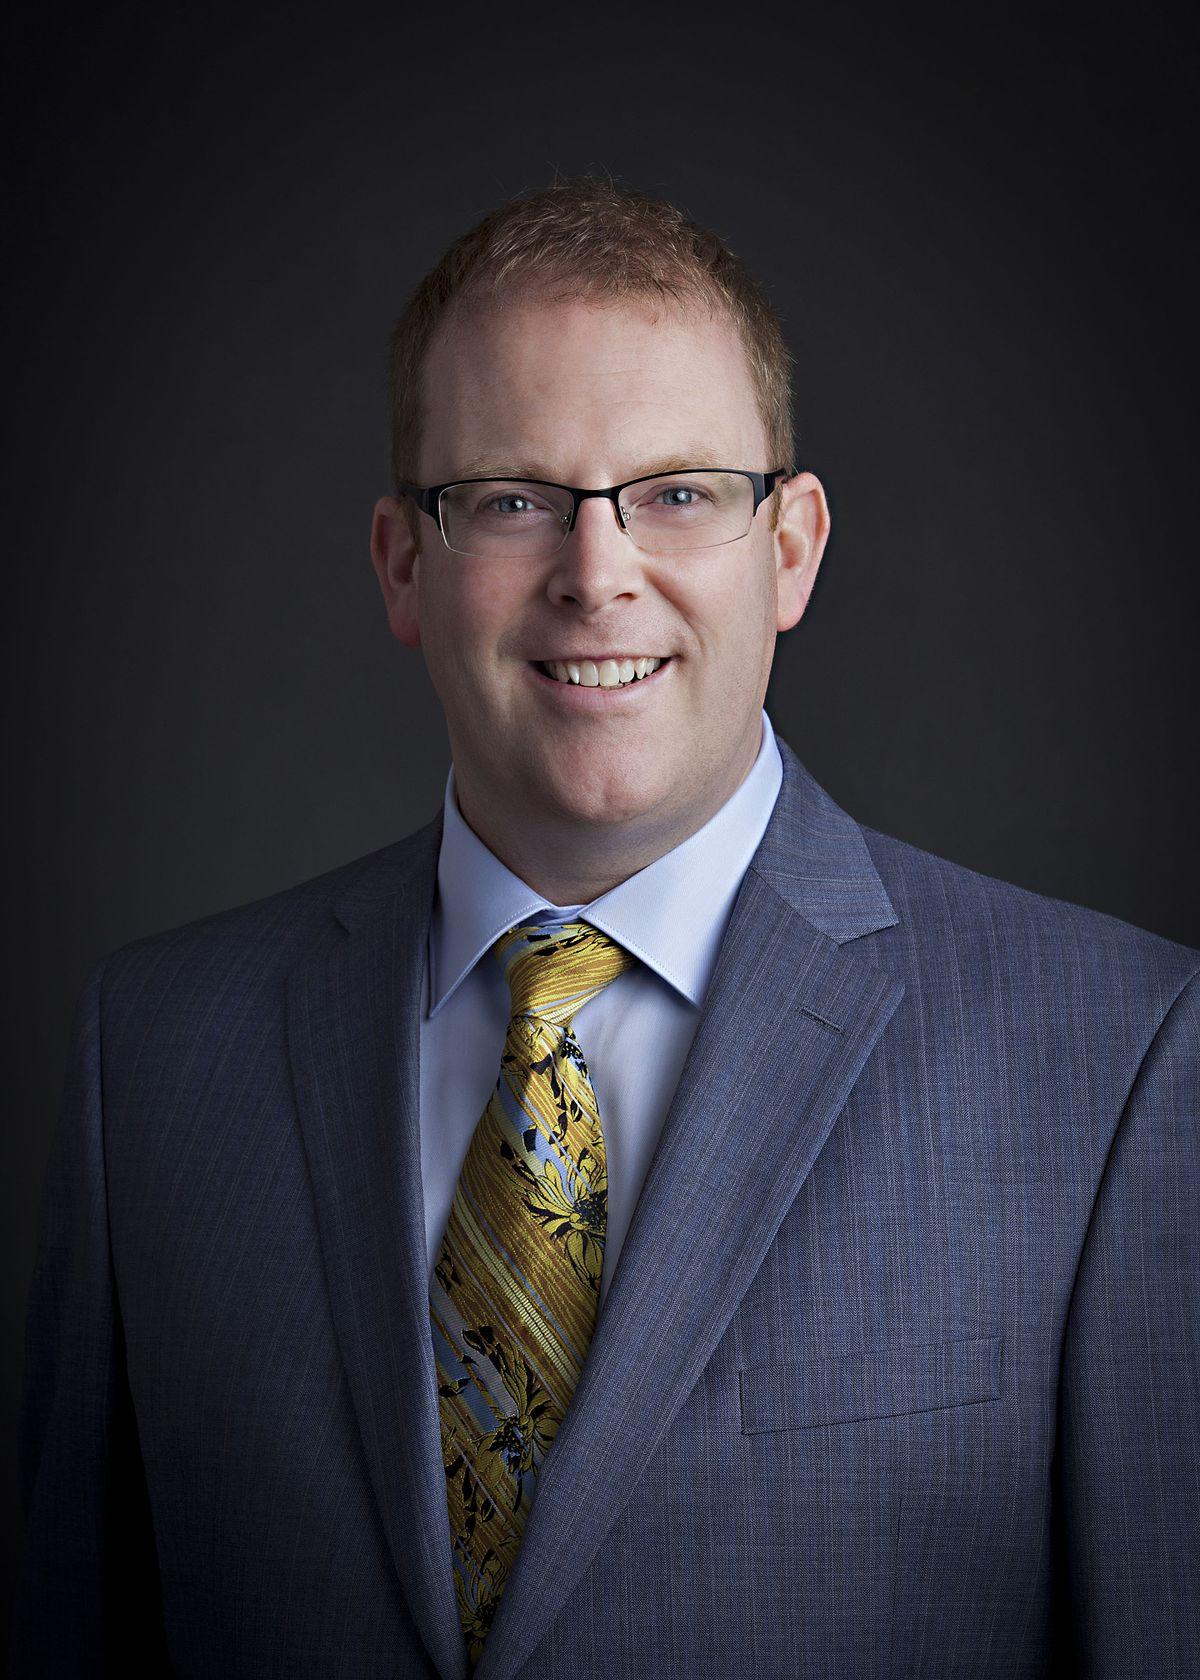 Steve Kent (politician) - Wikipedia